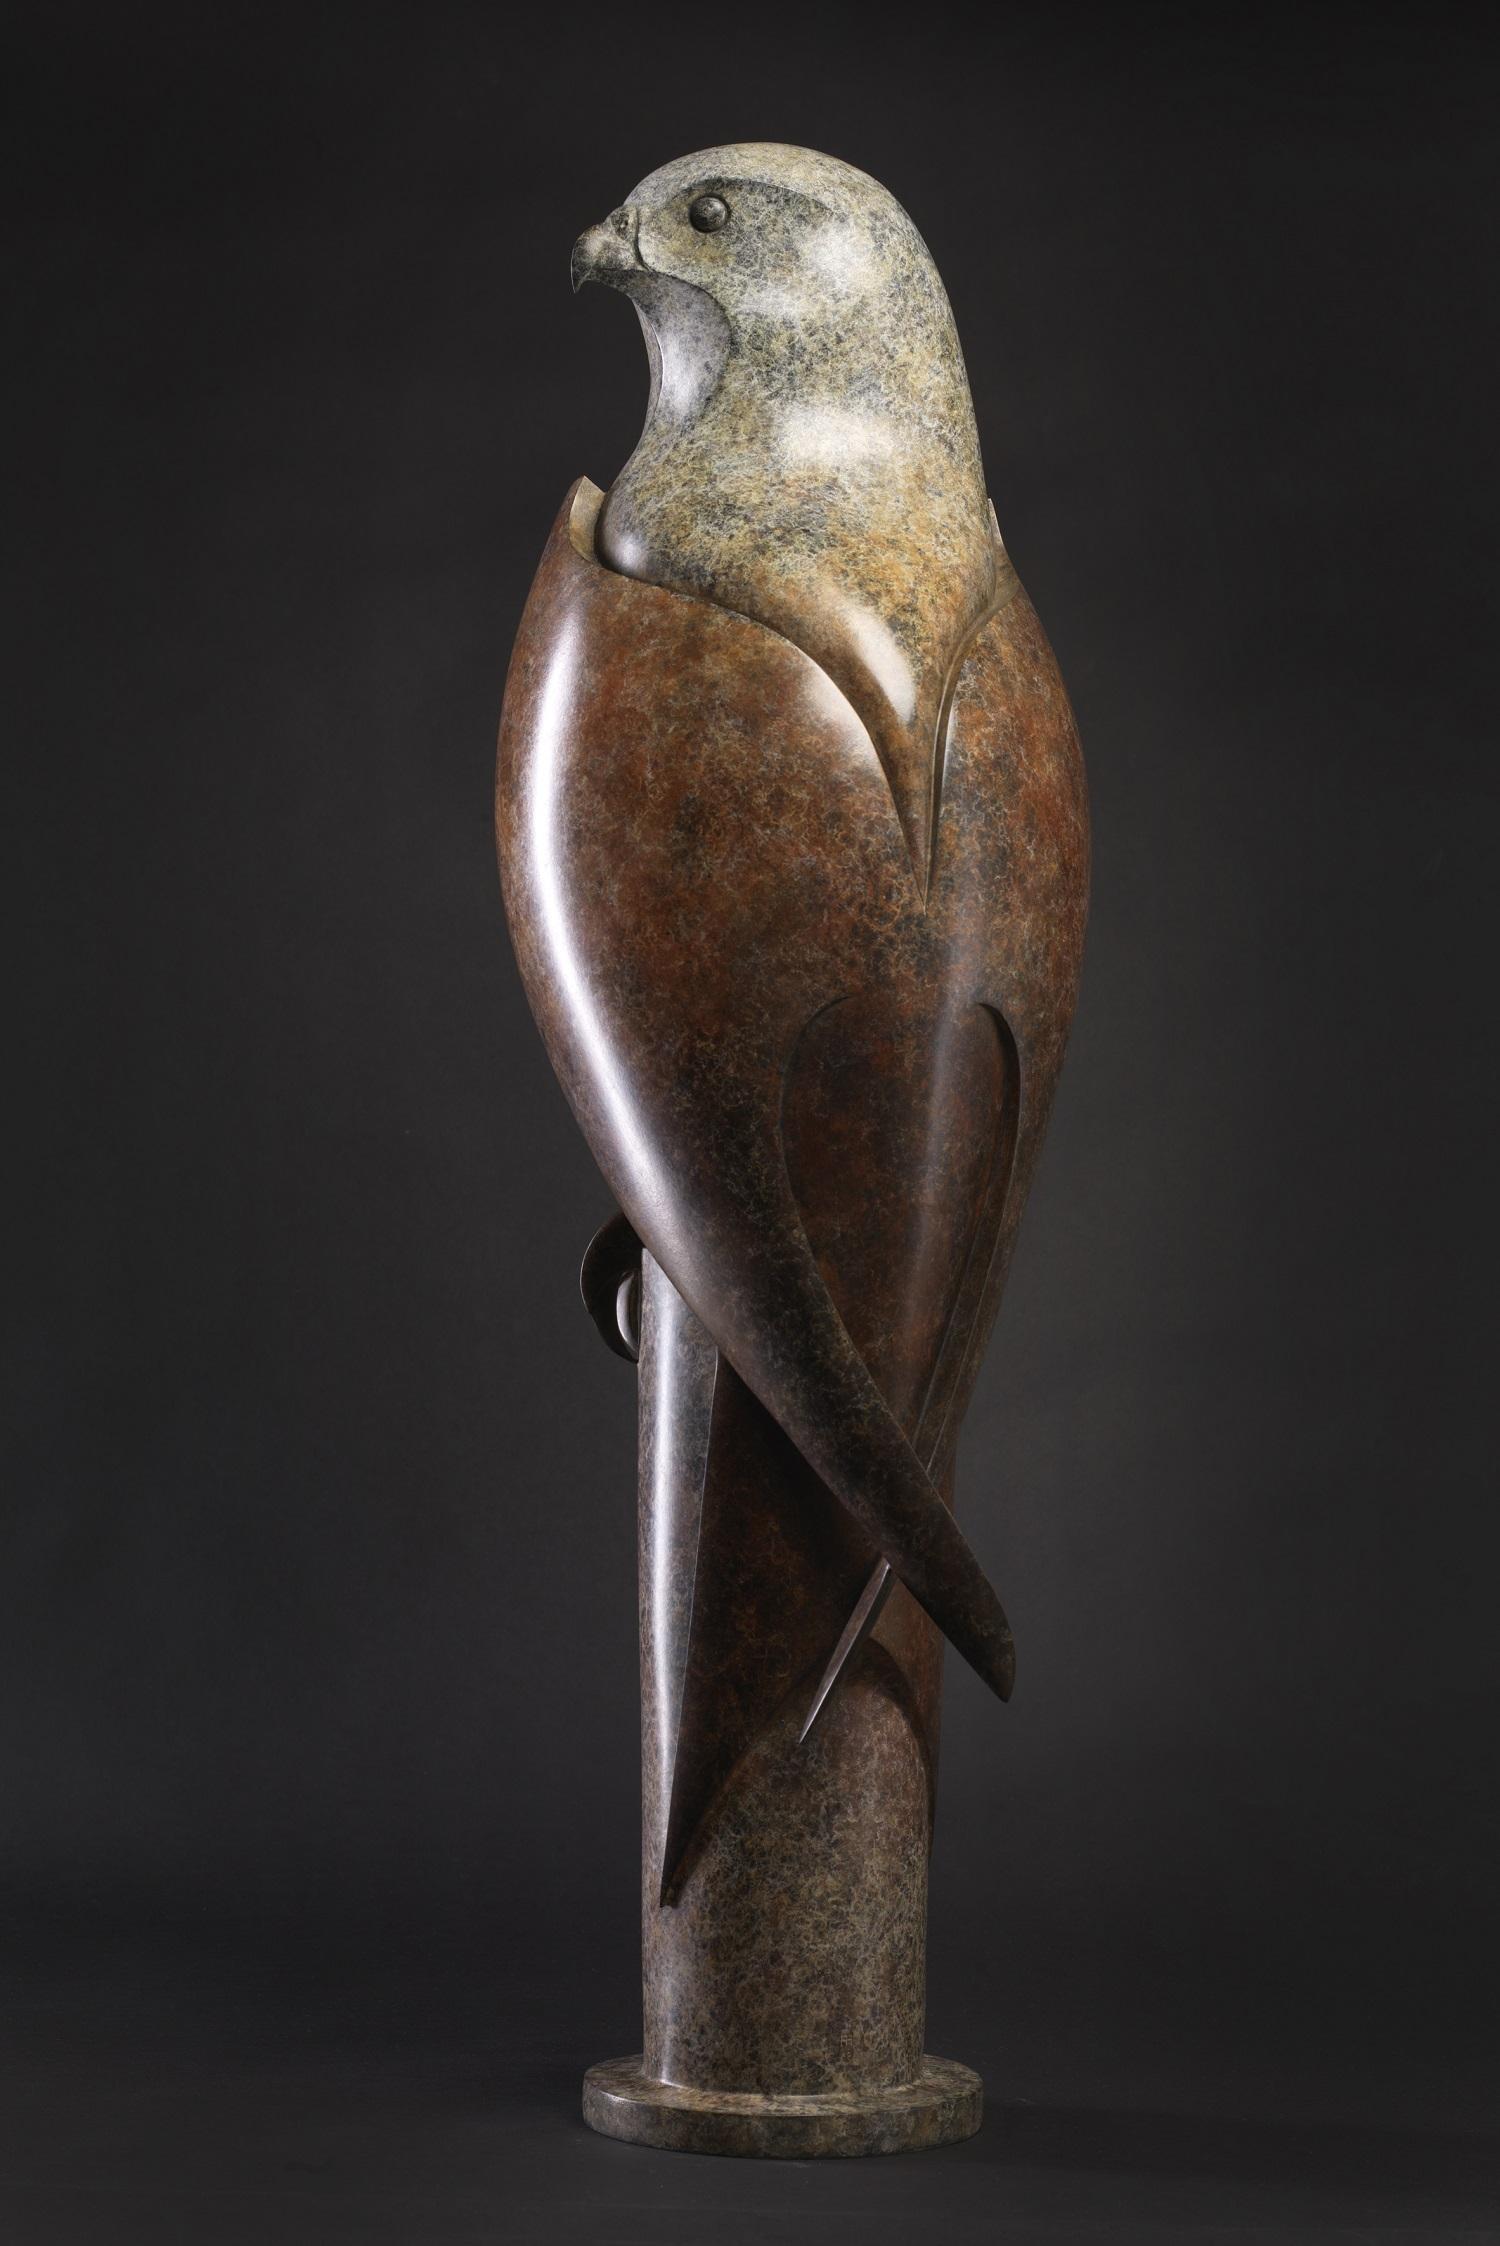 Red Kite  bronze  H - 77.5cm  £10,950